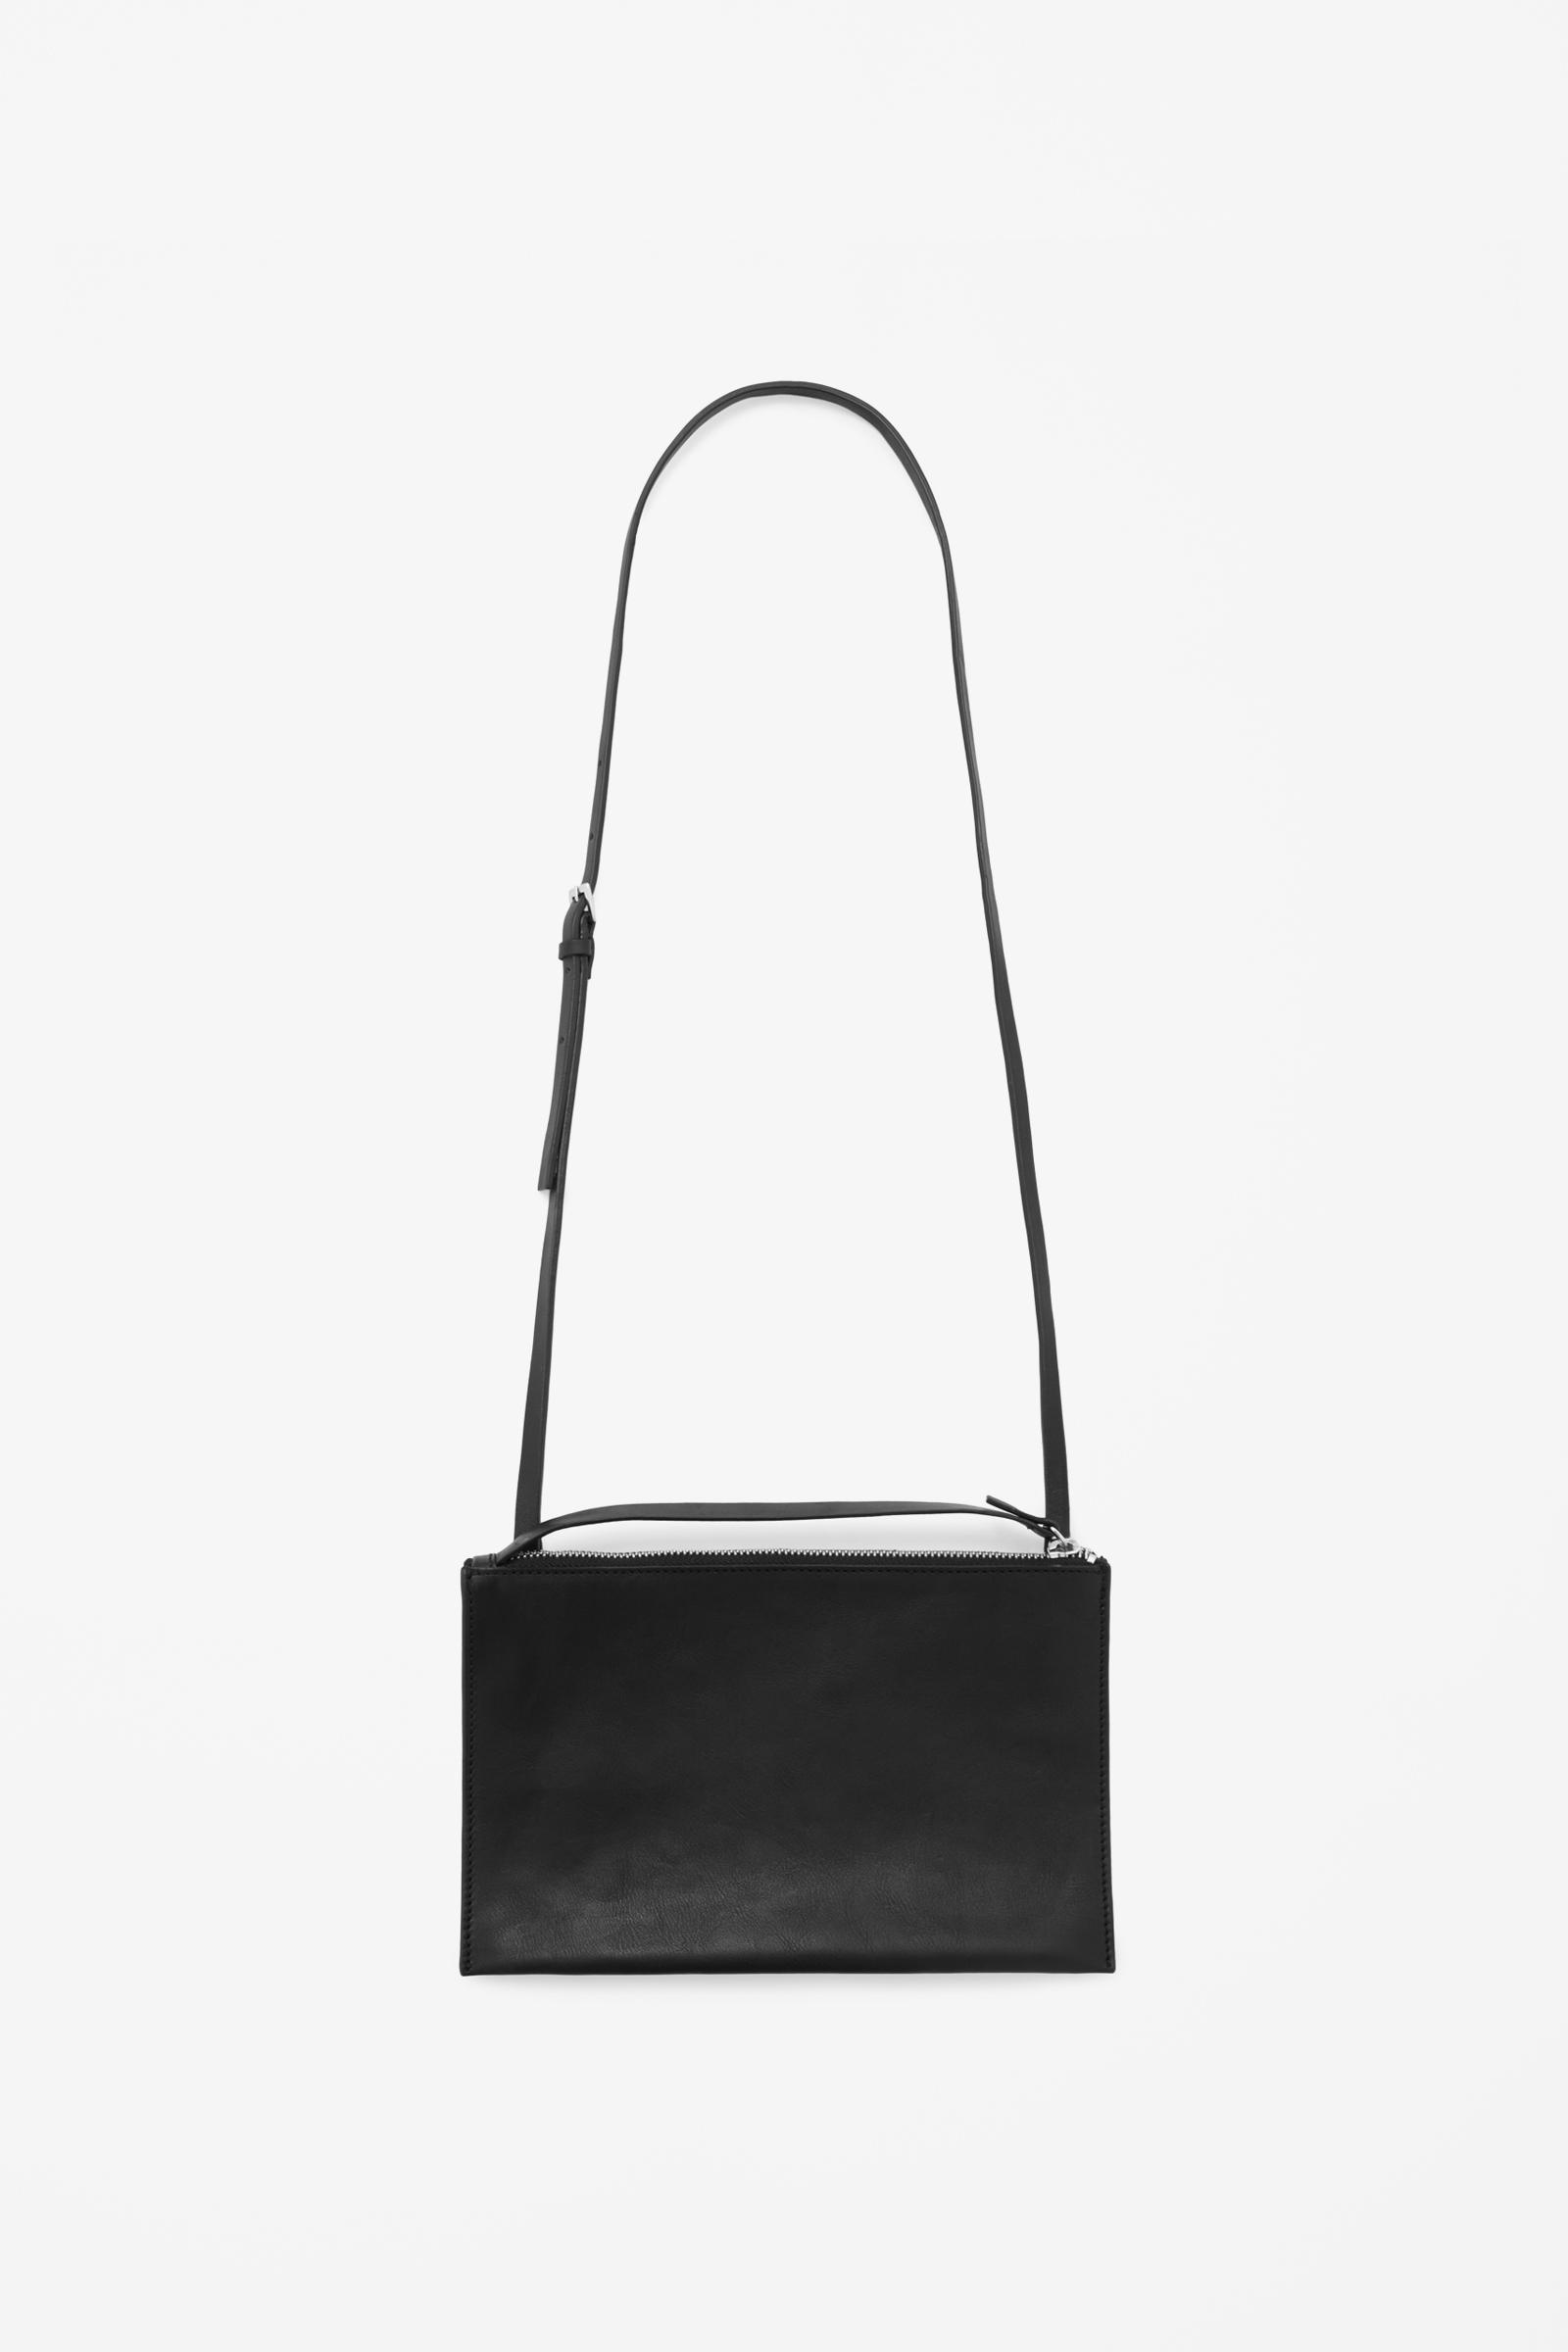 Cos Nylon Shoulder Bag 89